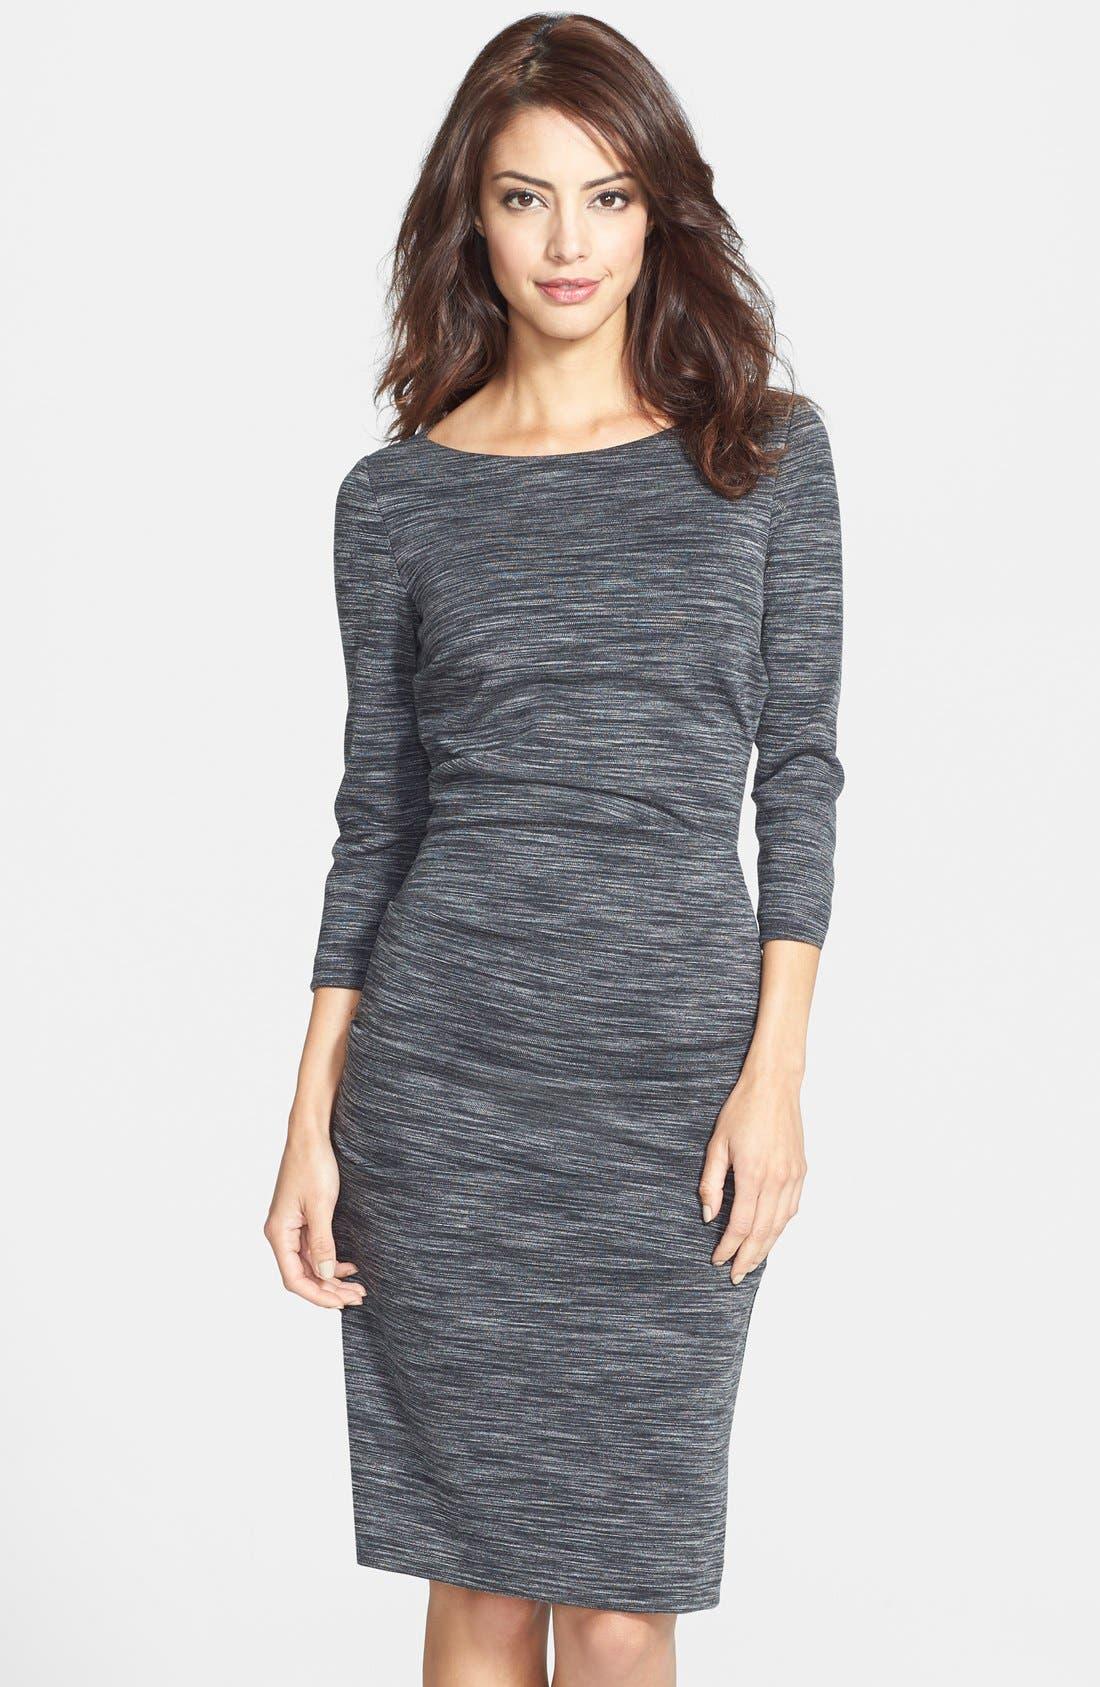 Alternate Image 1 Selected - Nicole Miller 'Christina' Ponte Sheath Dress